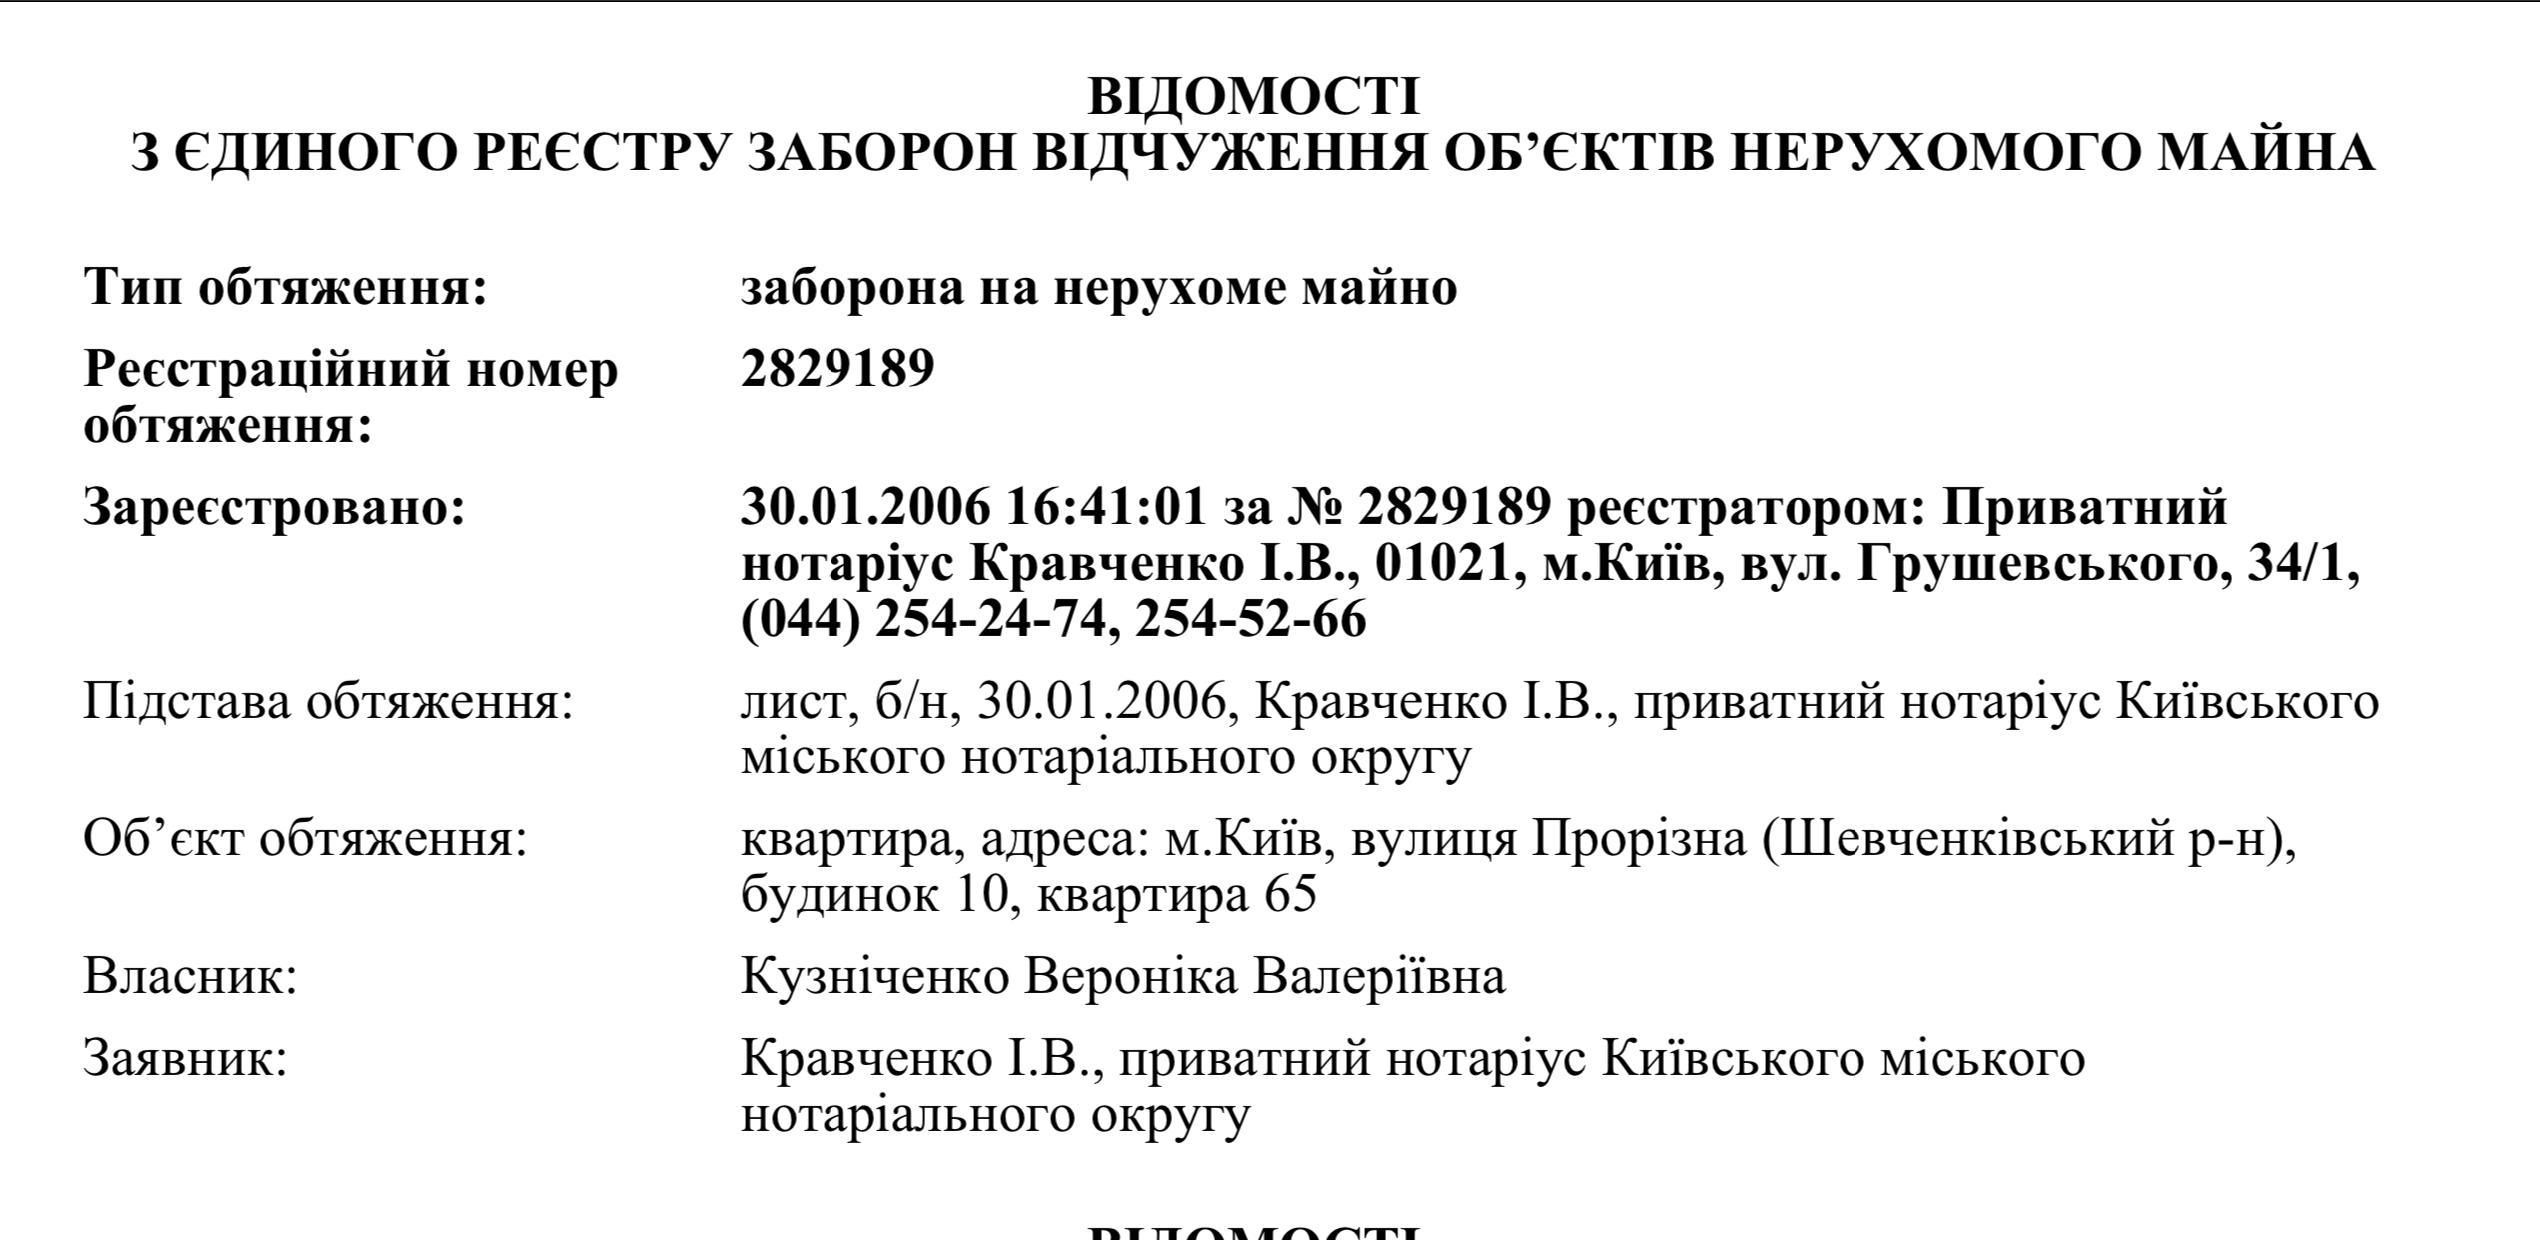 image http://forum.setam.net.ua/assets/images/873-49nJSl15xYdNBvXv.png